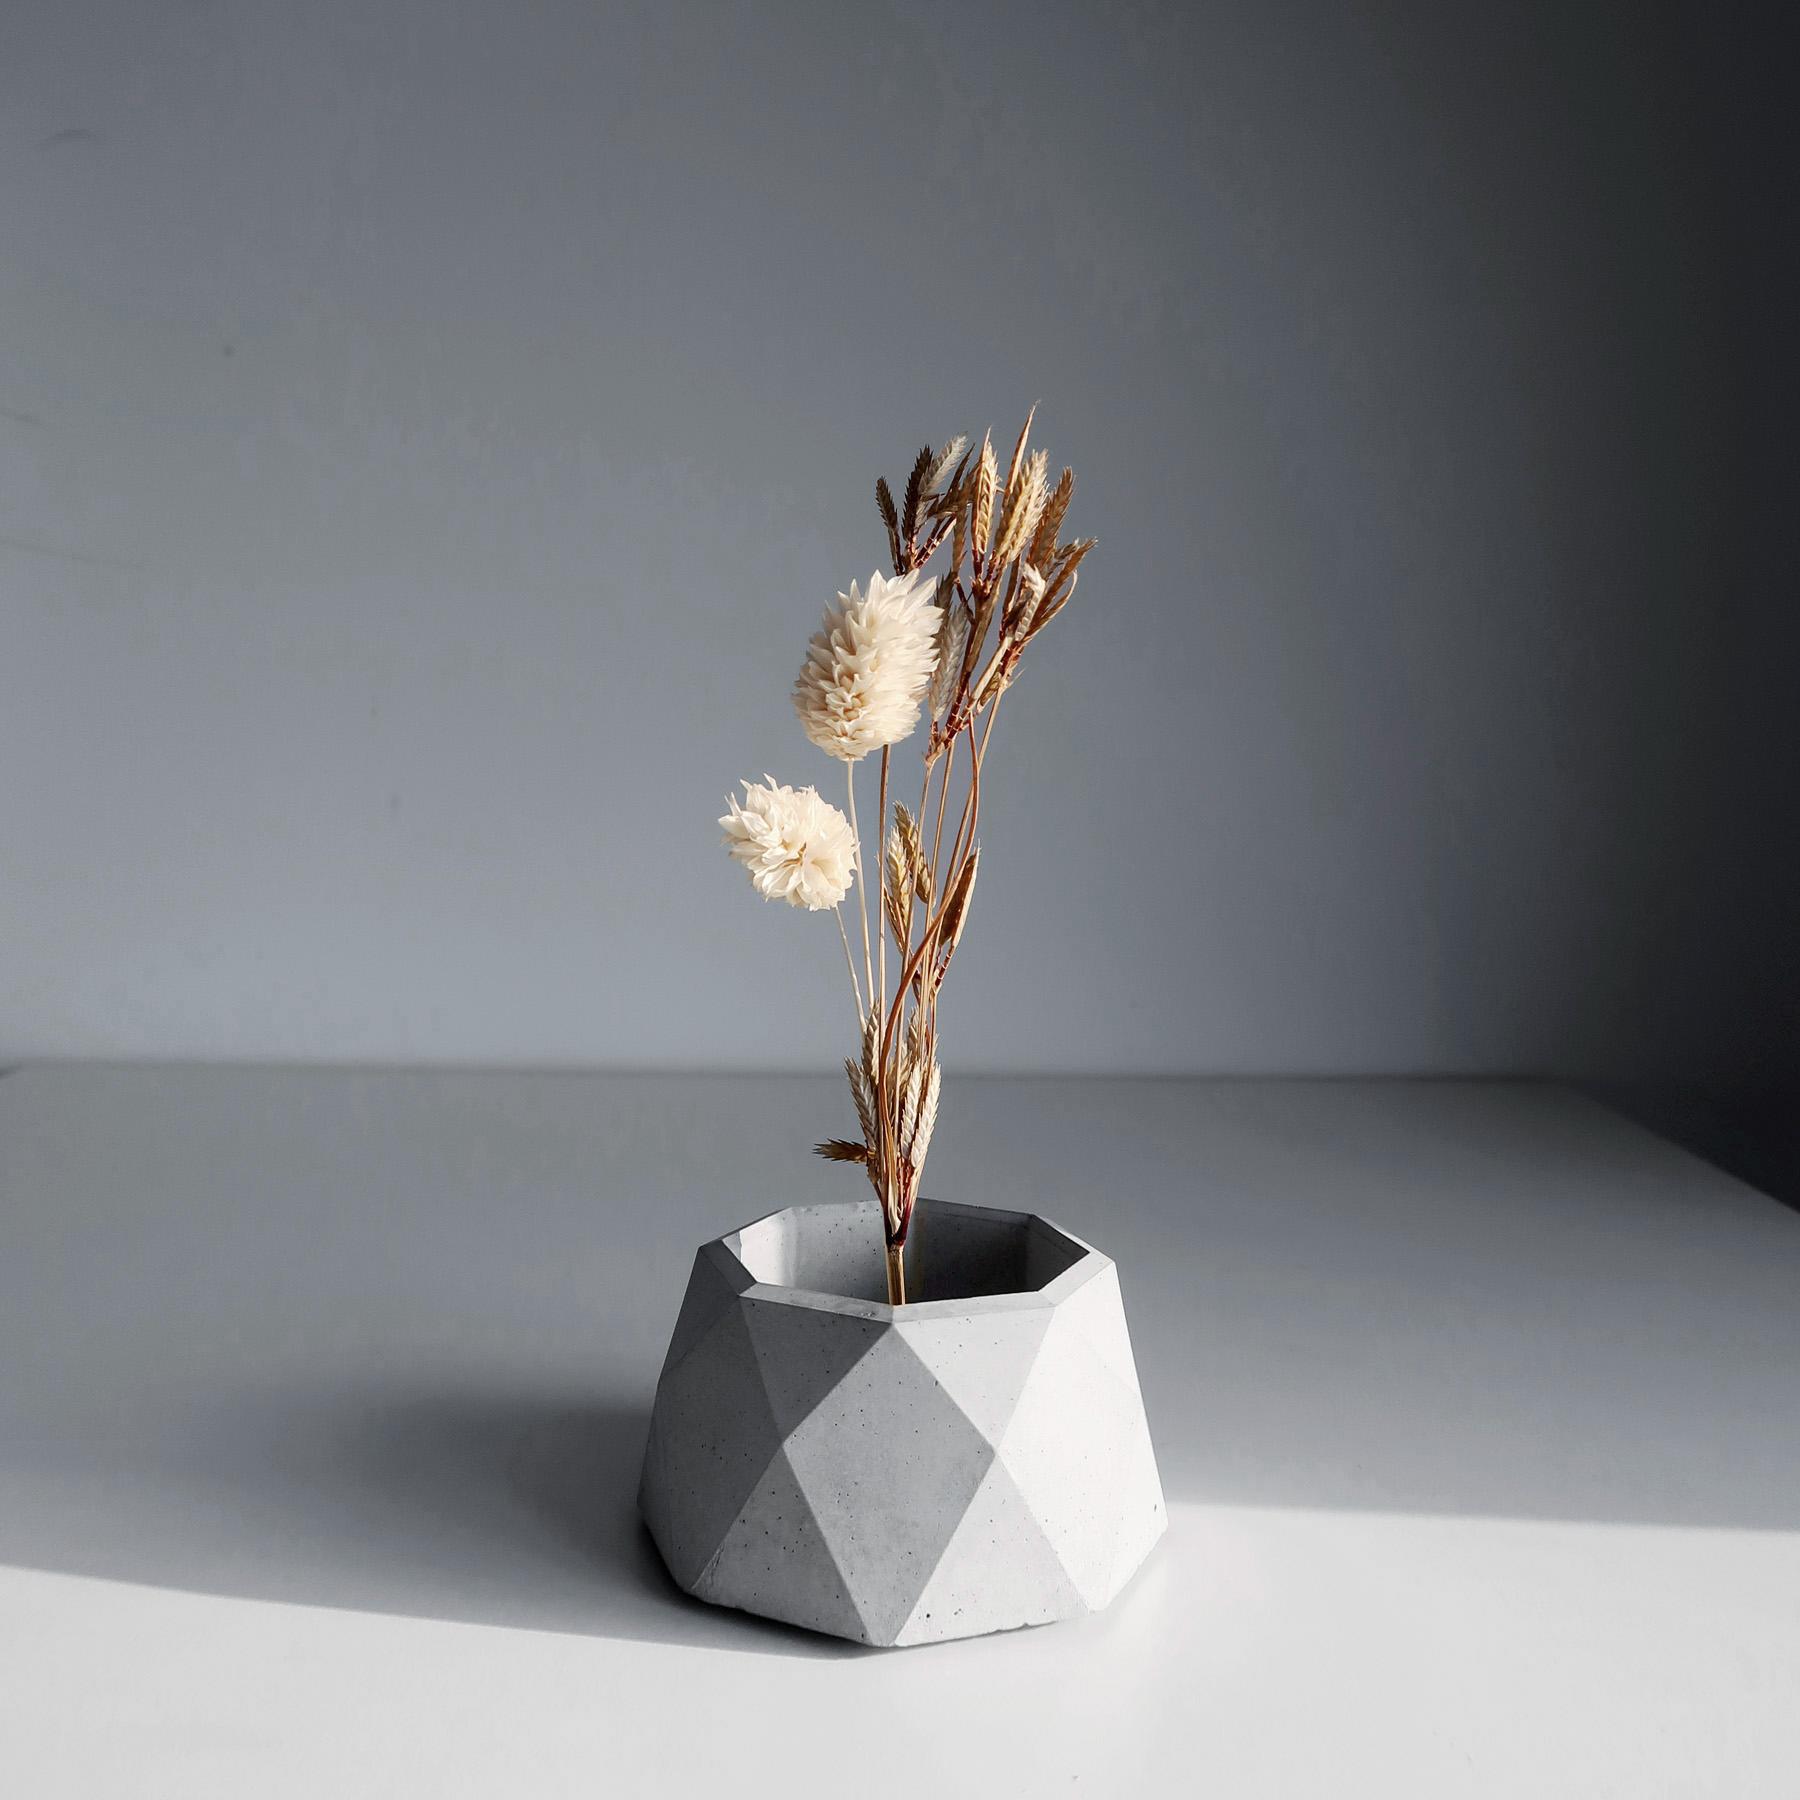 CENTENARY 百年紀念多用途水泥黃銅座盆器 / Geometry concrete candle holder with dried flowers